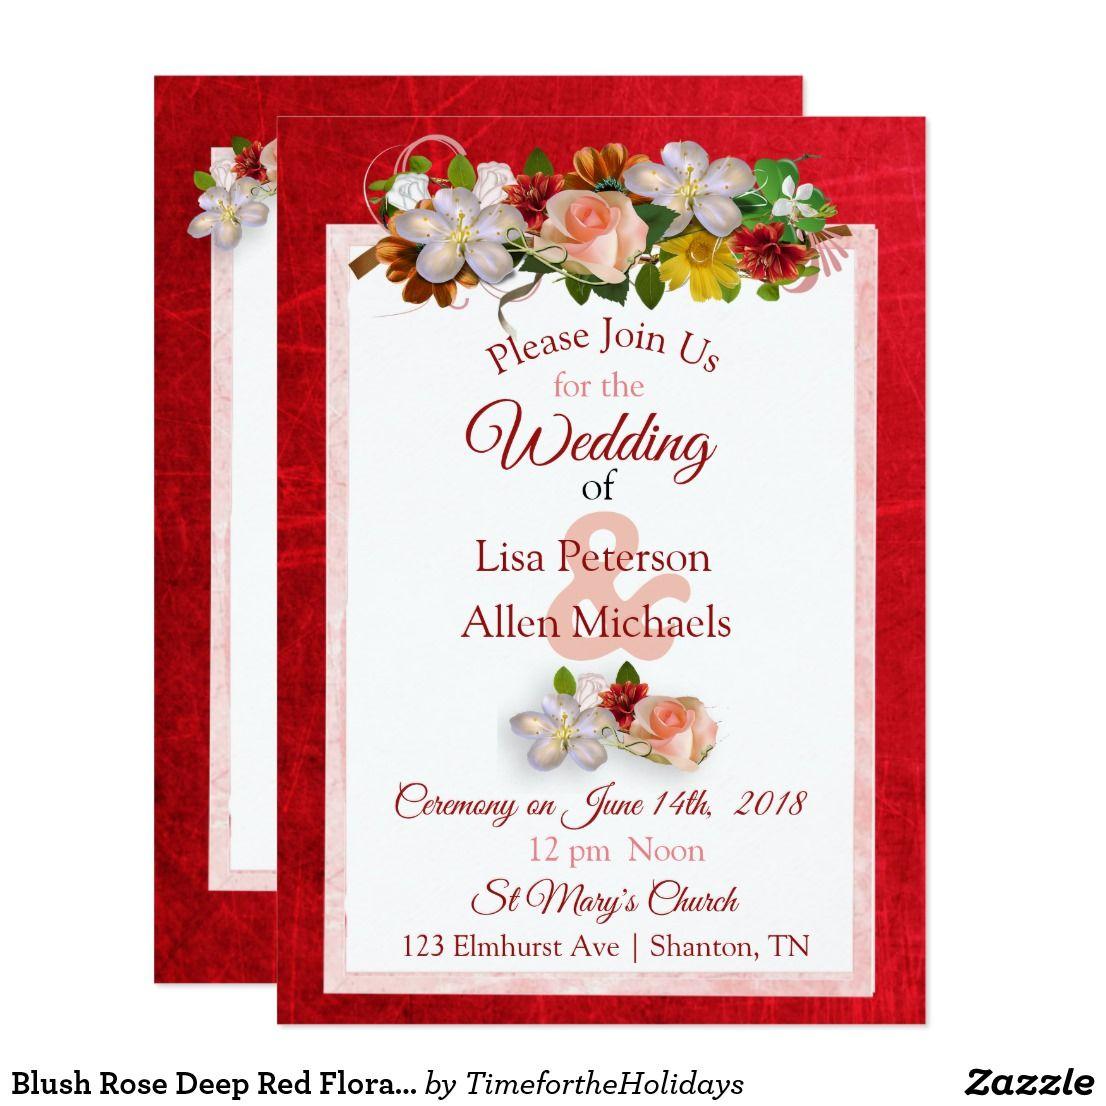 Blush Rose Deep Red Floral Wedding Invitation | Blushes